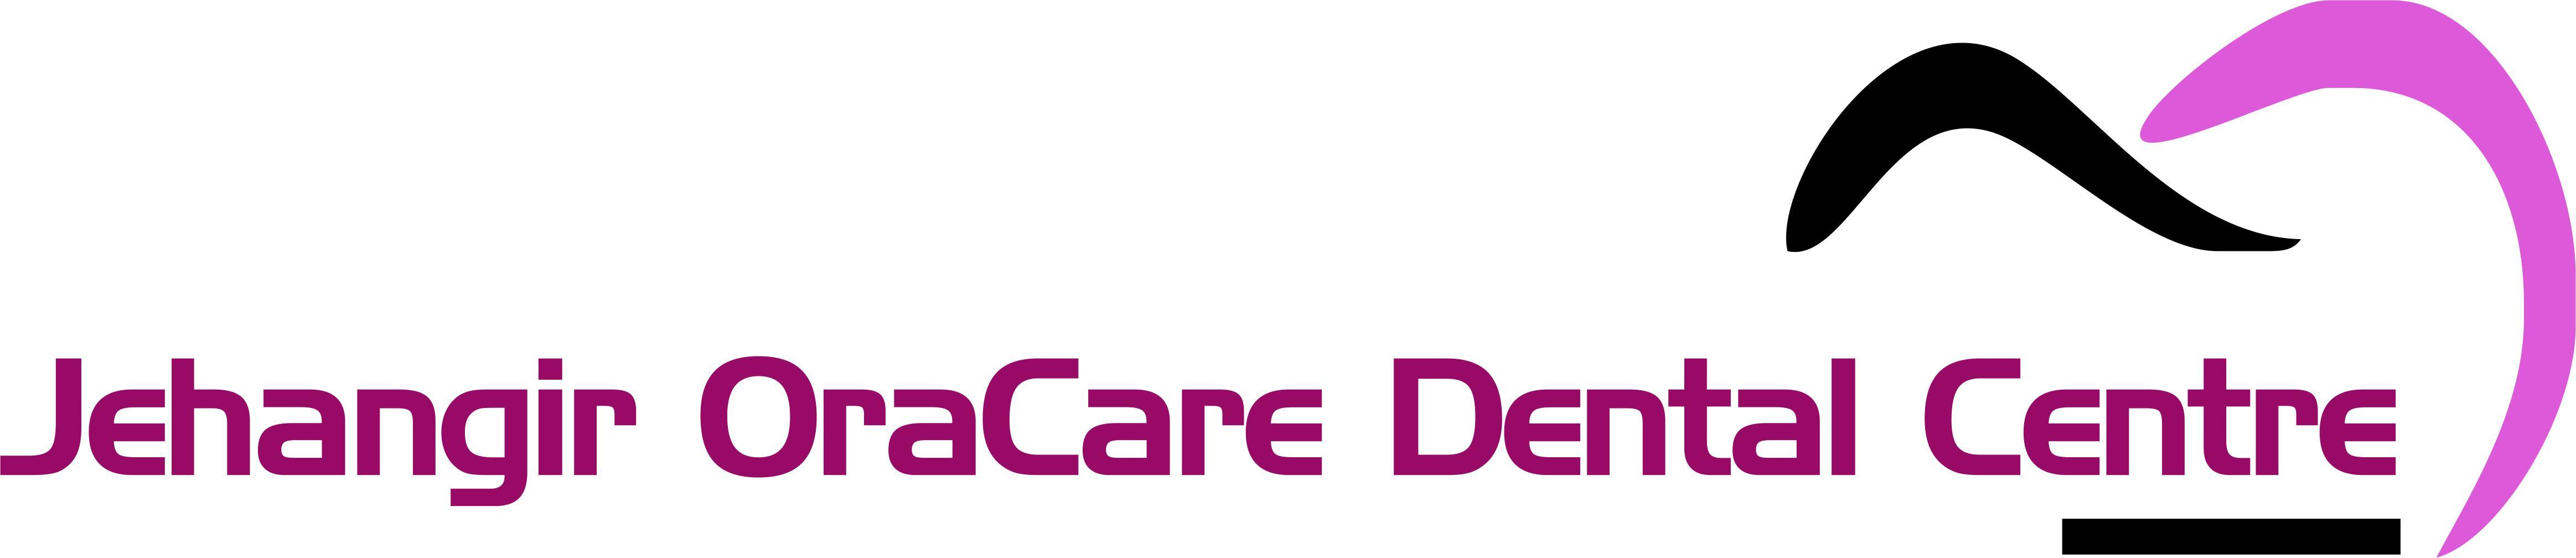 Jehangir Oracare Dental Centre - Jehangir Hospital Branch